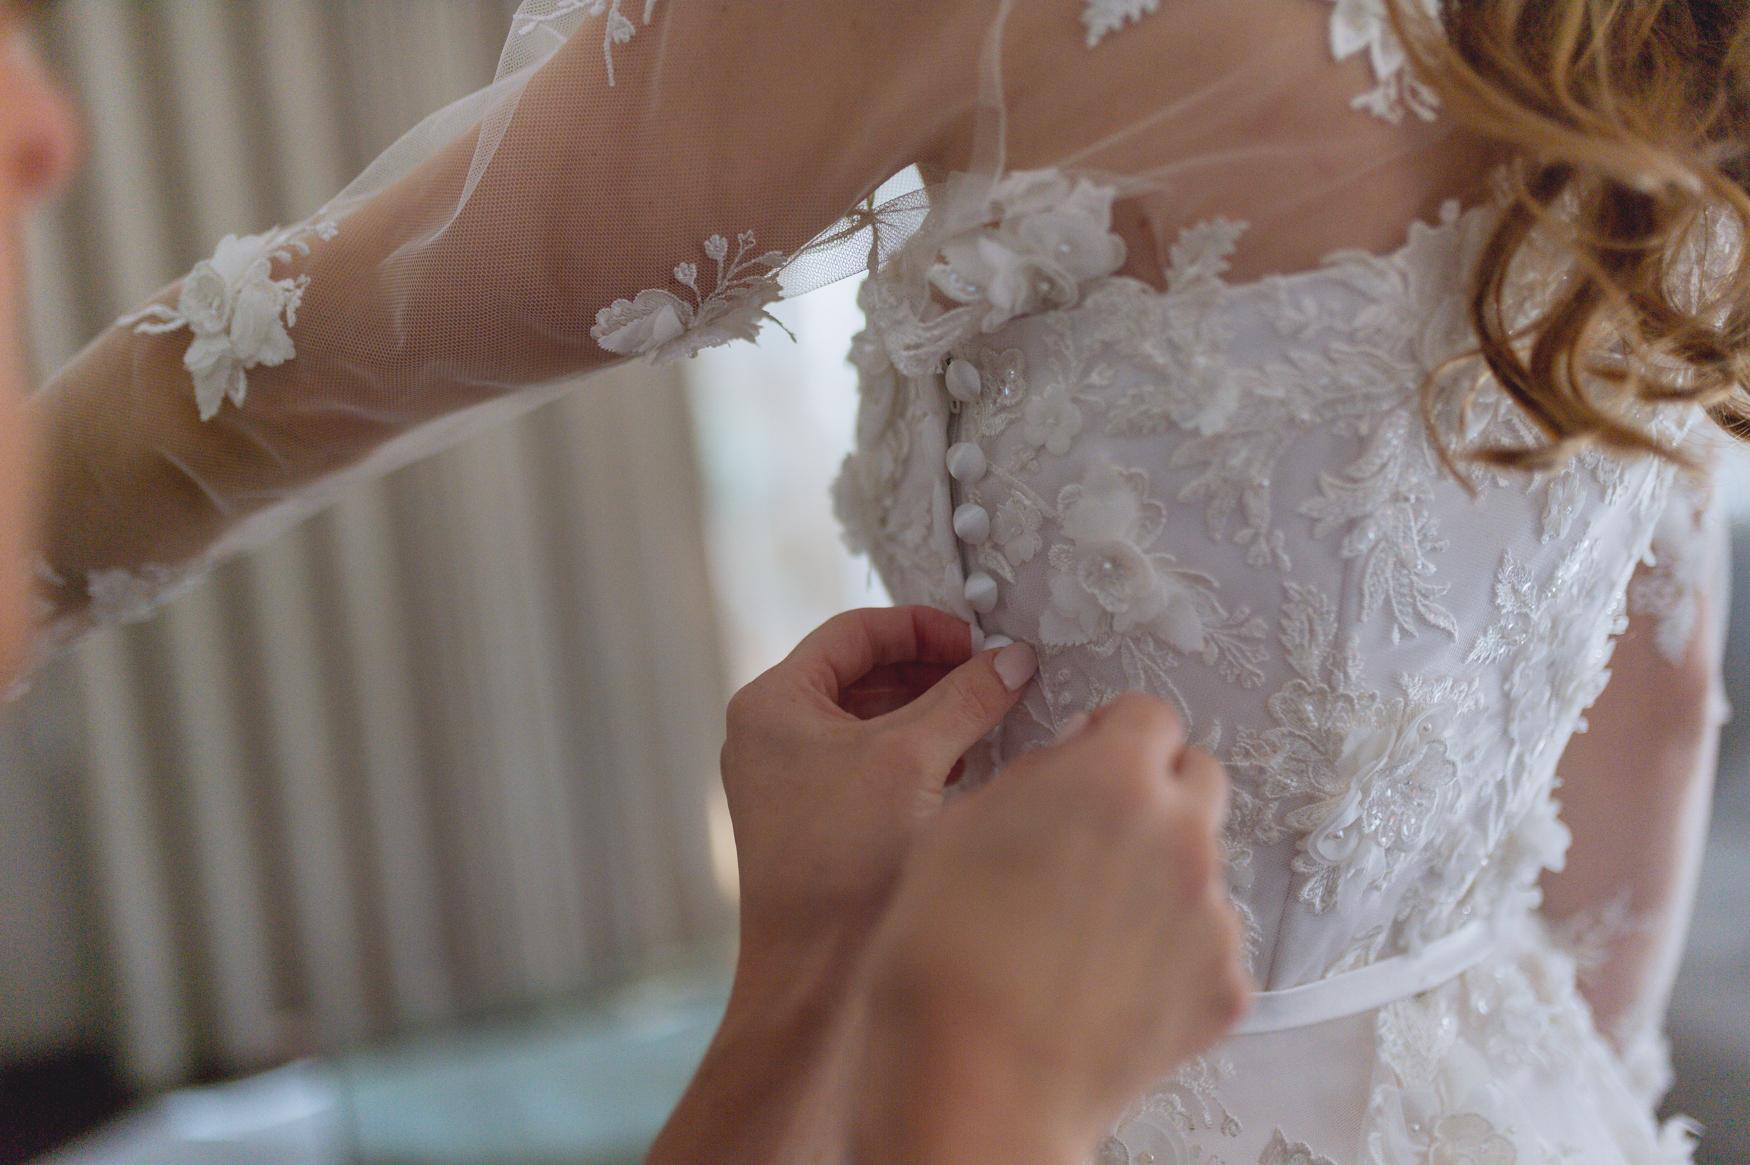 Leon_&_Martine's_Wedding_Photographs_17th_April_2019_@johnhenryweddingphoto_Low_Resolution_Web-079.JPG